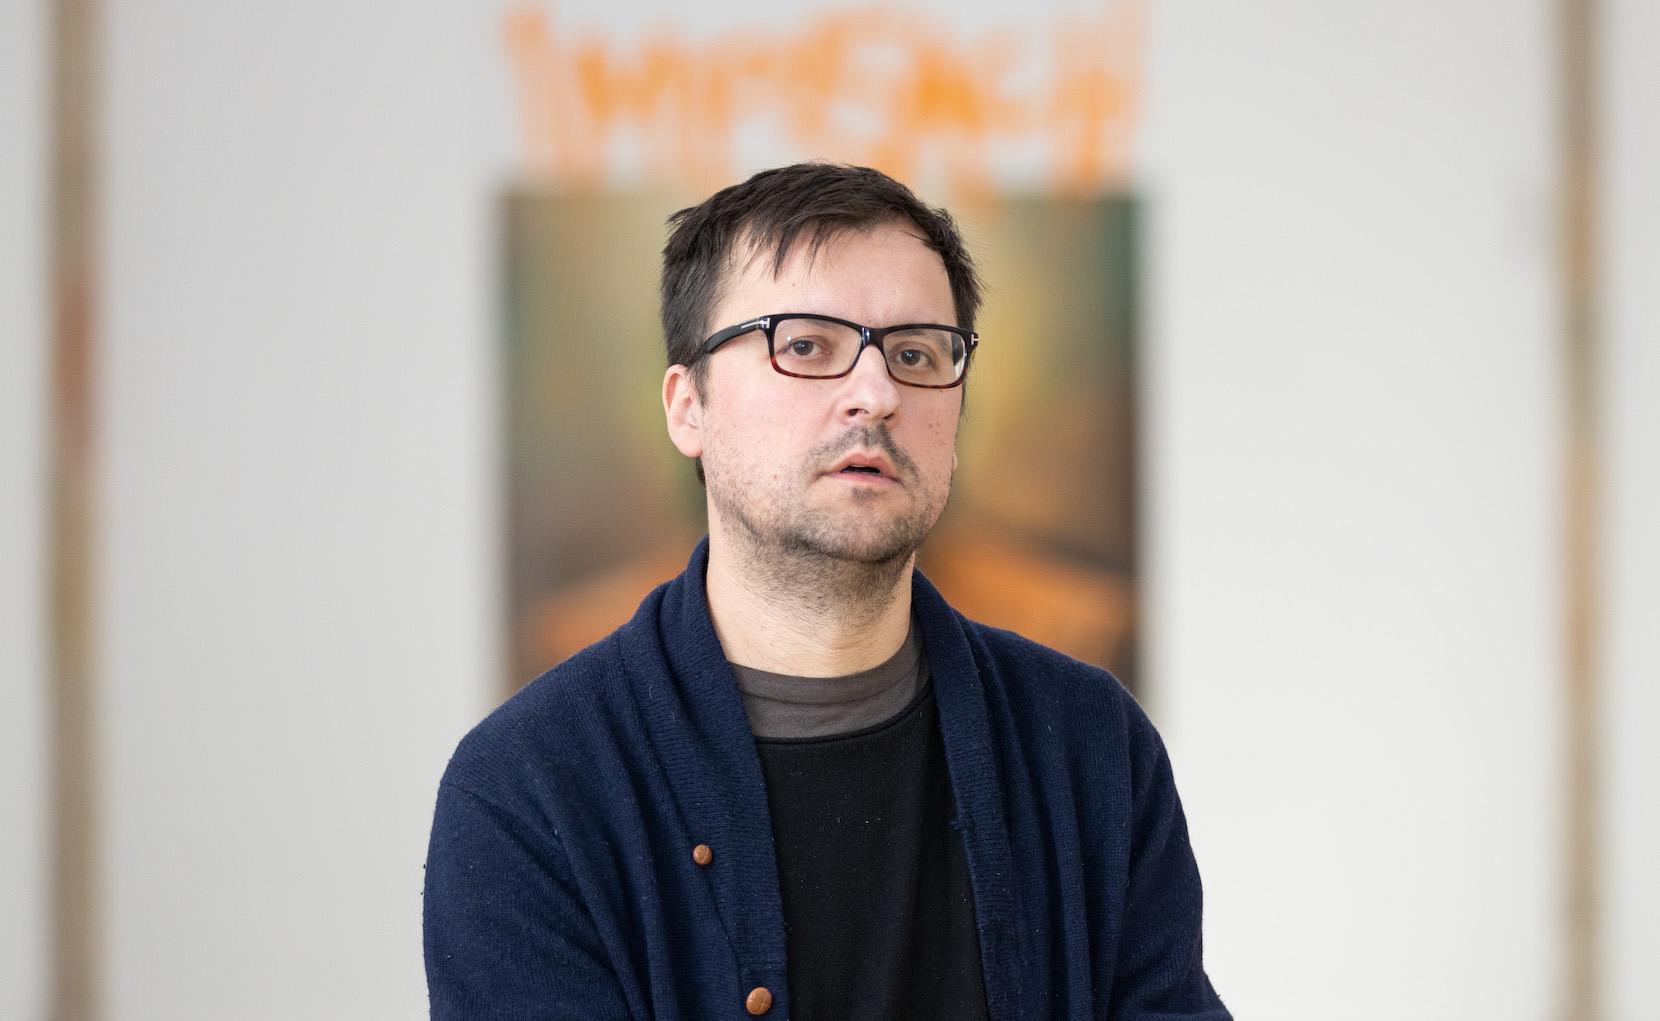 Filip Markiewicz | Celebration Factory, Ausstellungsansicht, Kunsthalle Osnabrück, 2019/20. Foto Courtesy: Friso Gentsch Kunsthalle Osnabrück